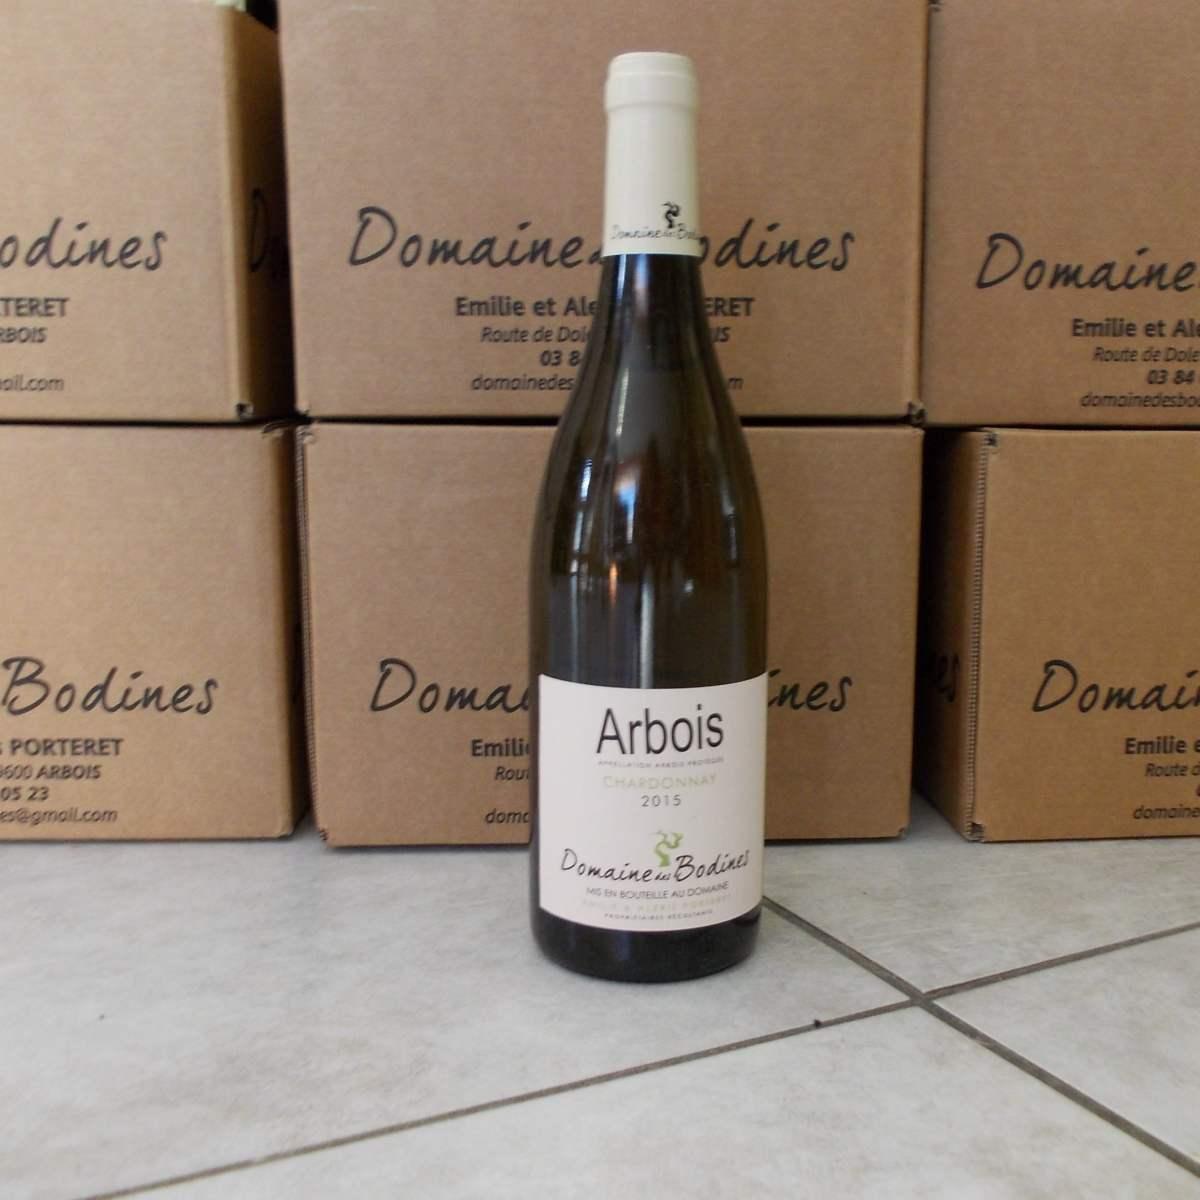 Chardonnay Bodines